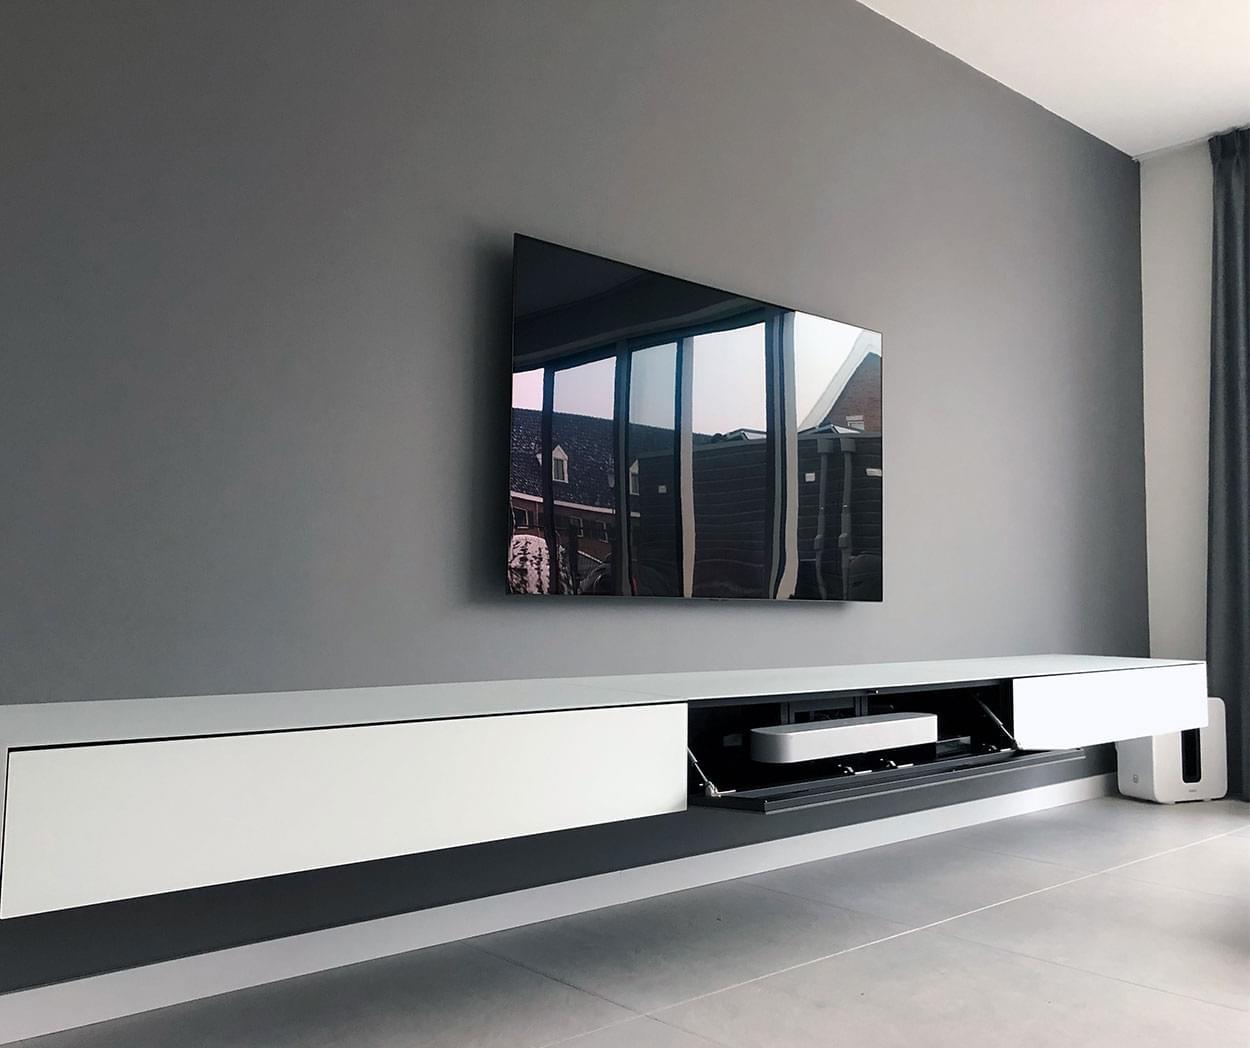 ameno-tv-meubel-stof-klep